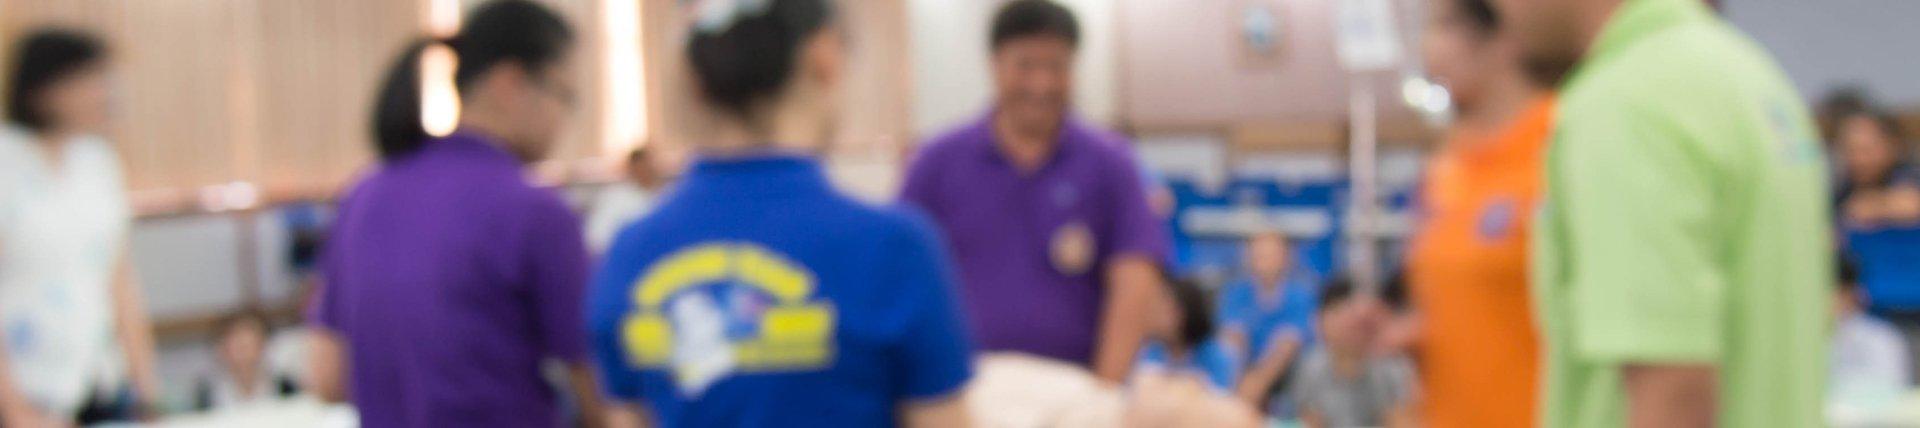 Corporate Health - Work Site Wellness Kinston NC